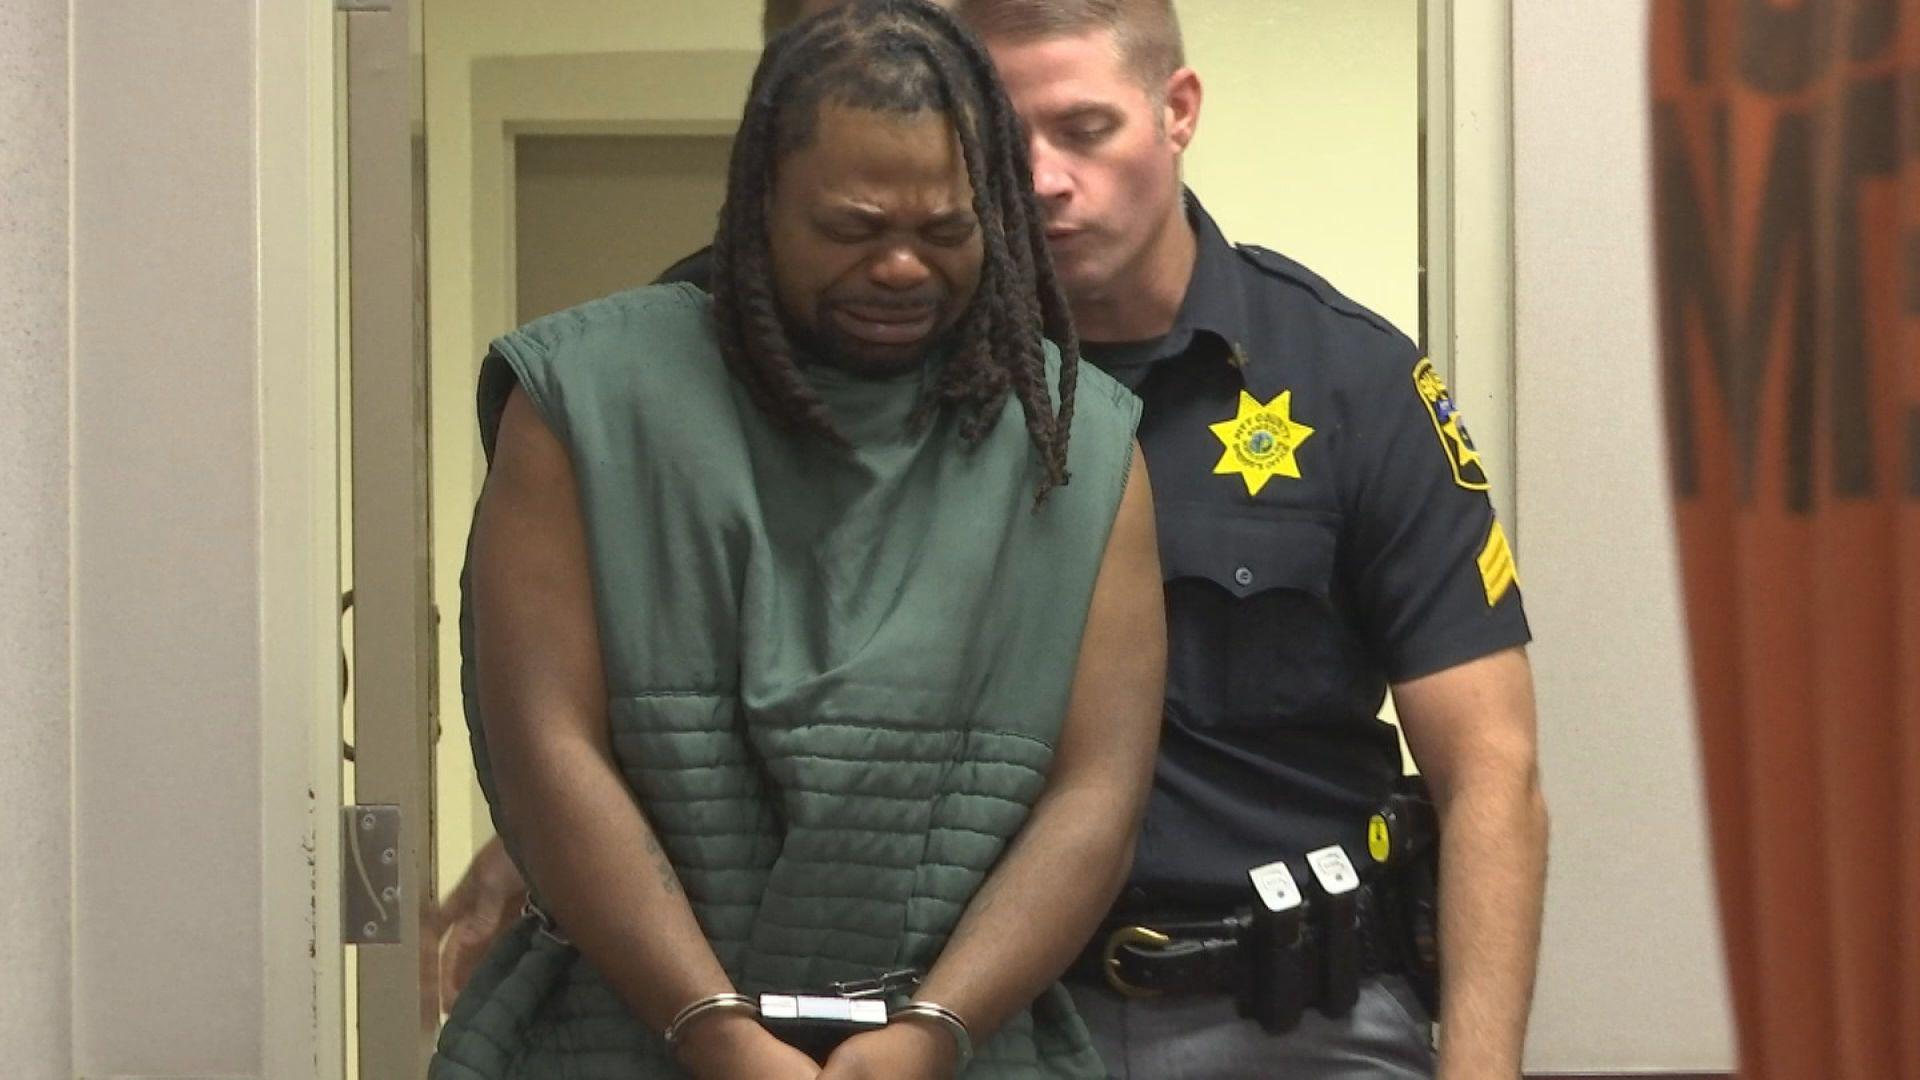 Marcus Mackey in Court